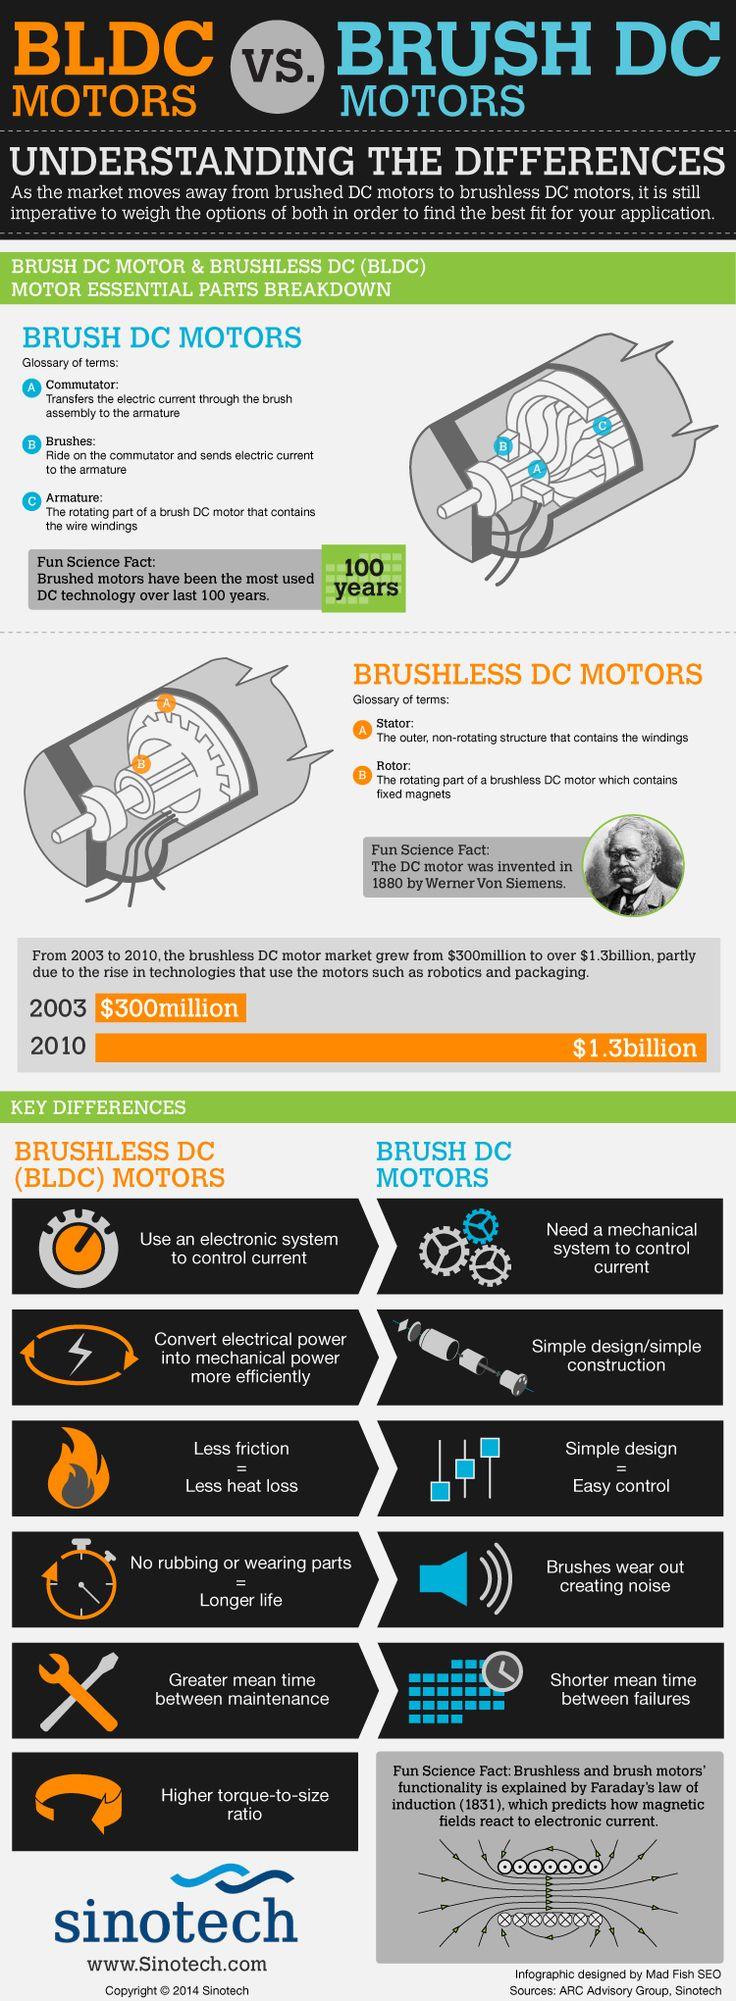 BLDC Motors vs. Brush DC Motors: Understanding the Differences